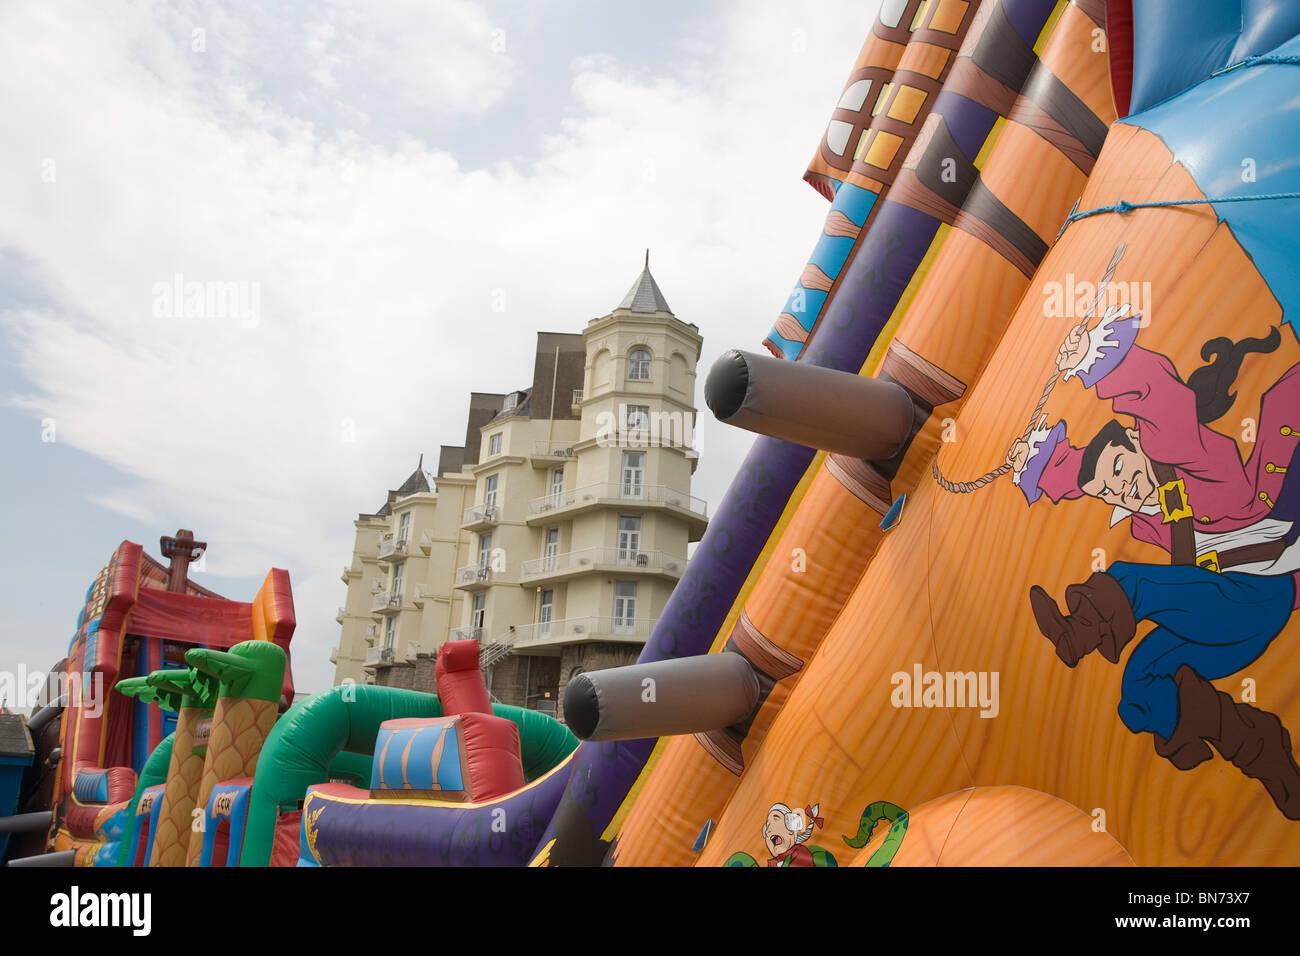 Kinder Unterhaltung Hüpfburg Llandudno Pier wales uk Stockbild